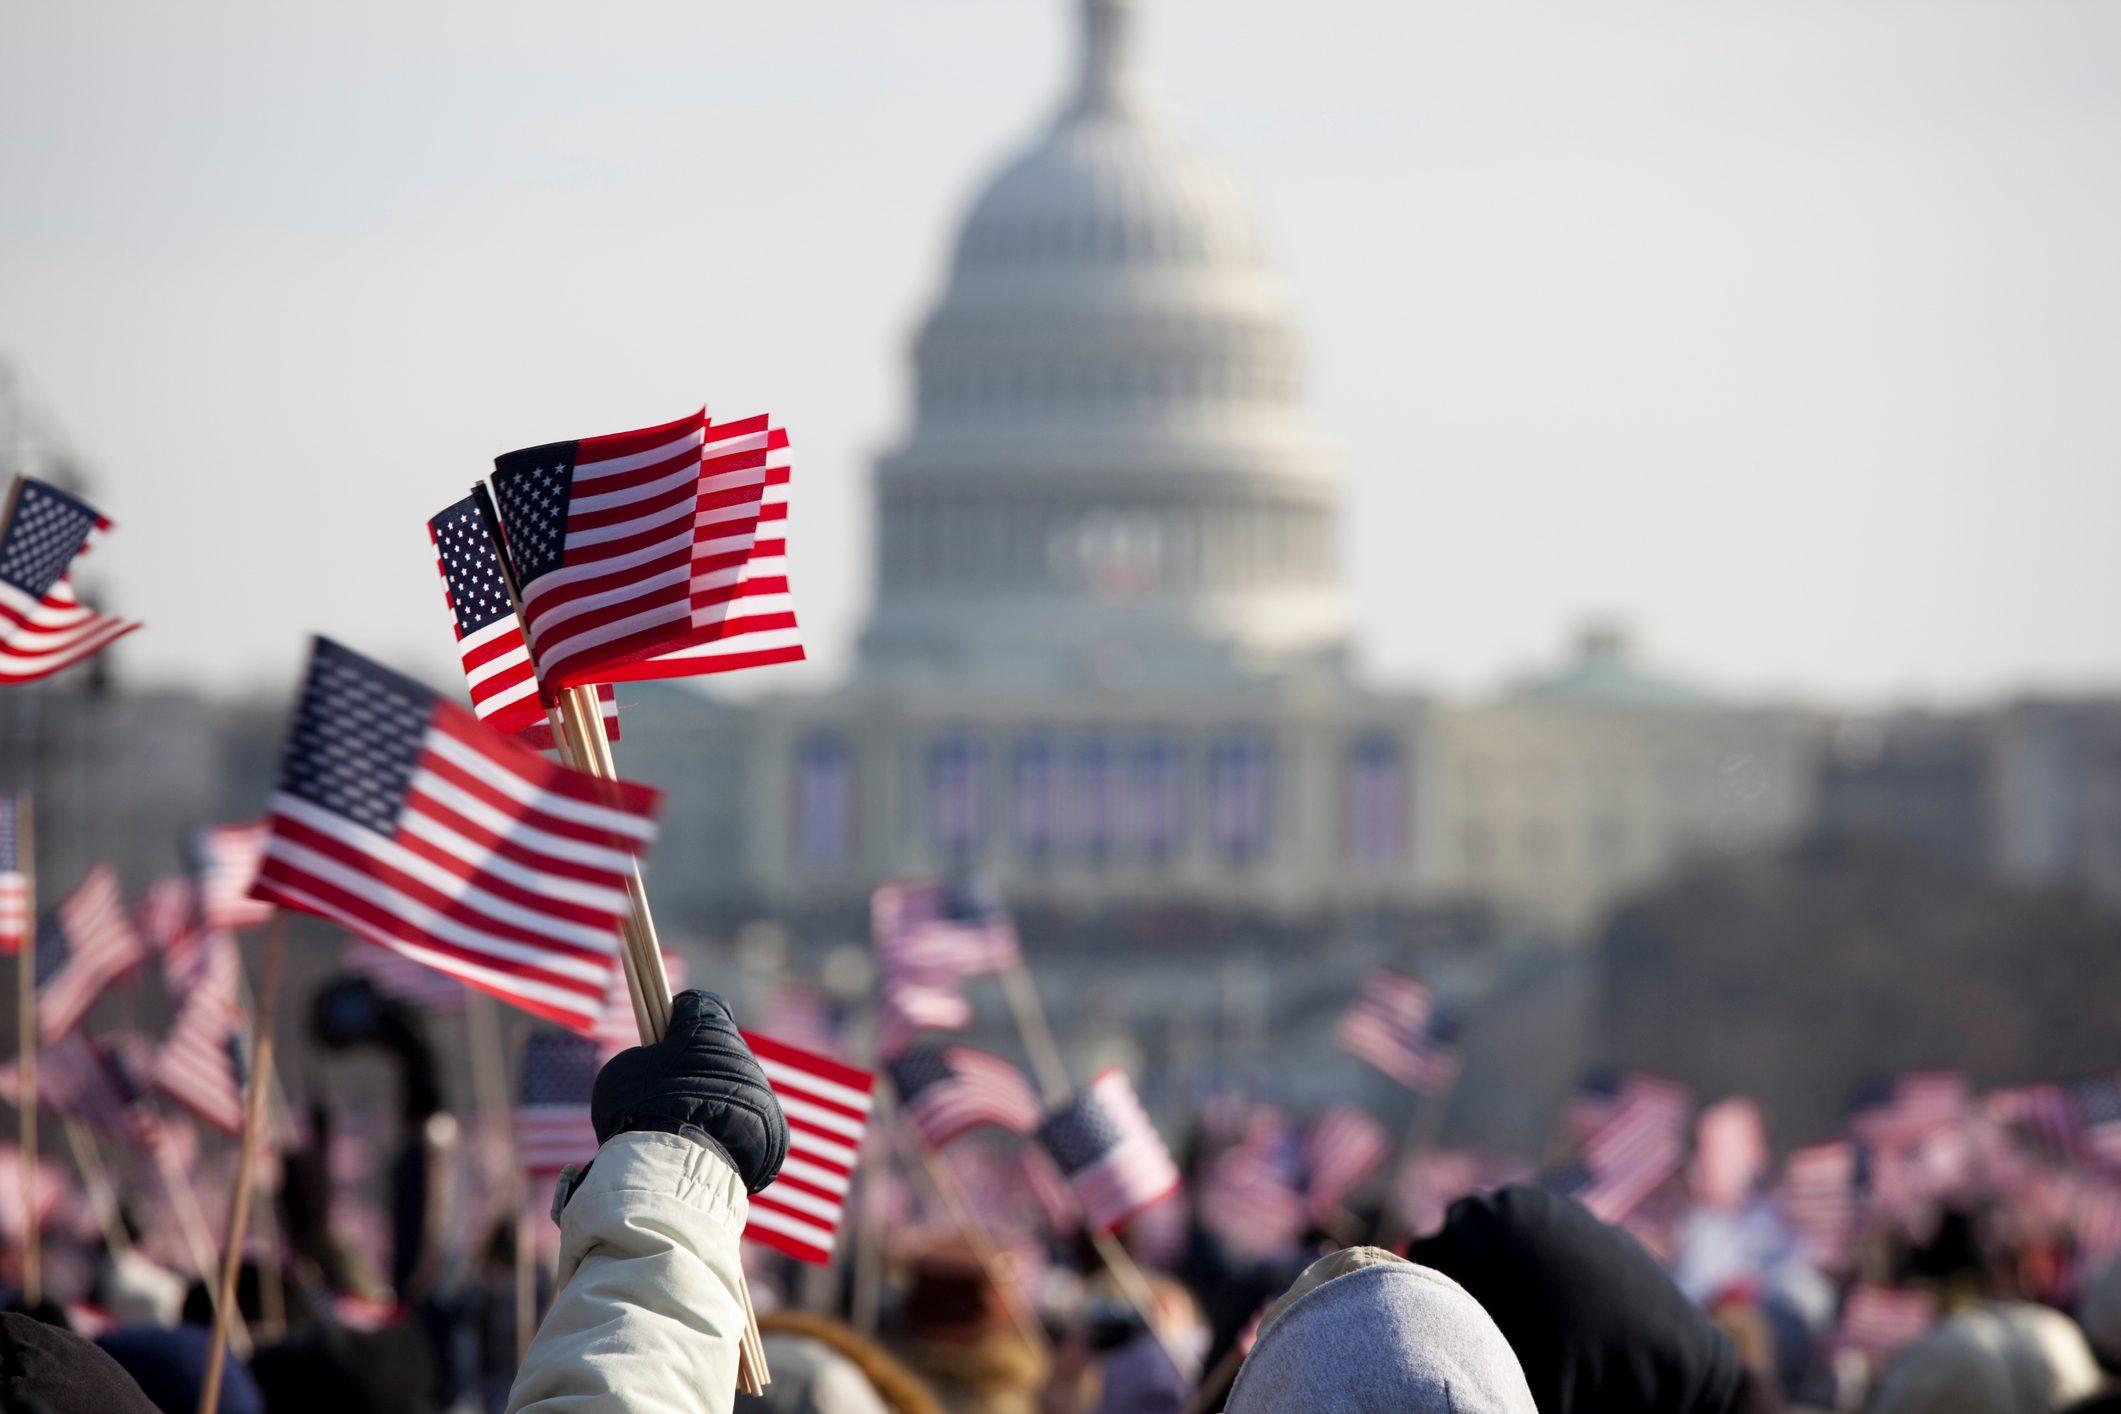 President Barack Obama's Presidential Inauguration at Capitol Building, Washington DC